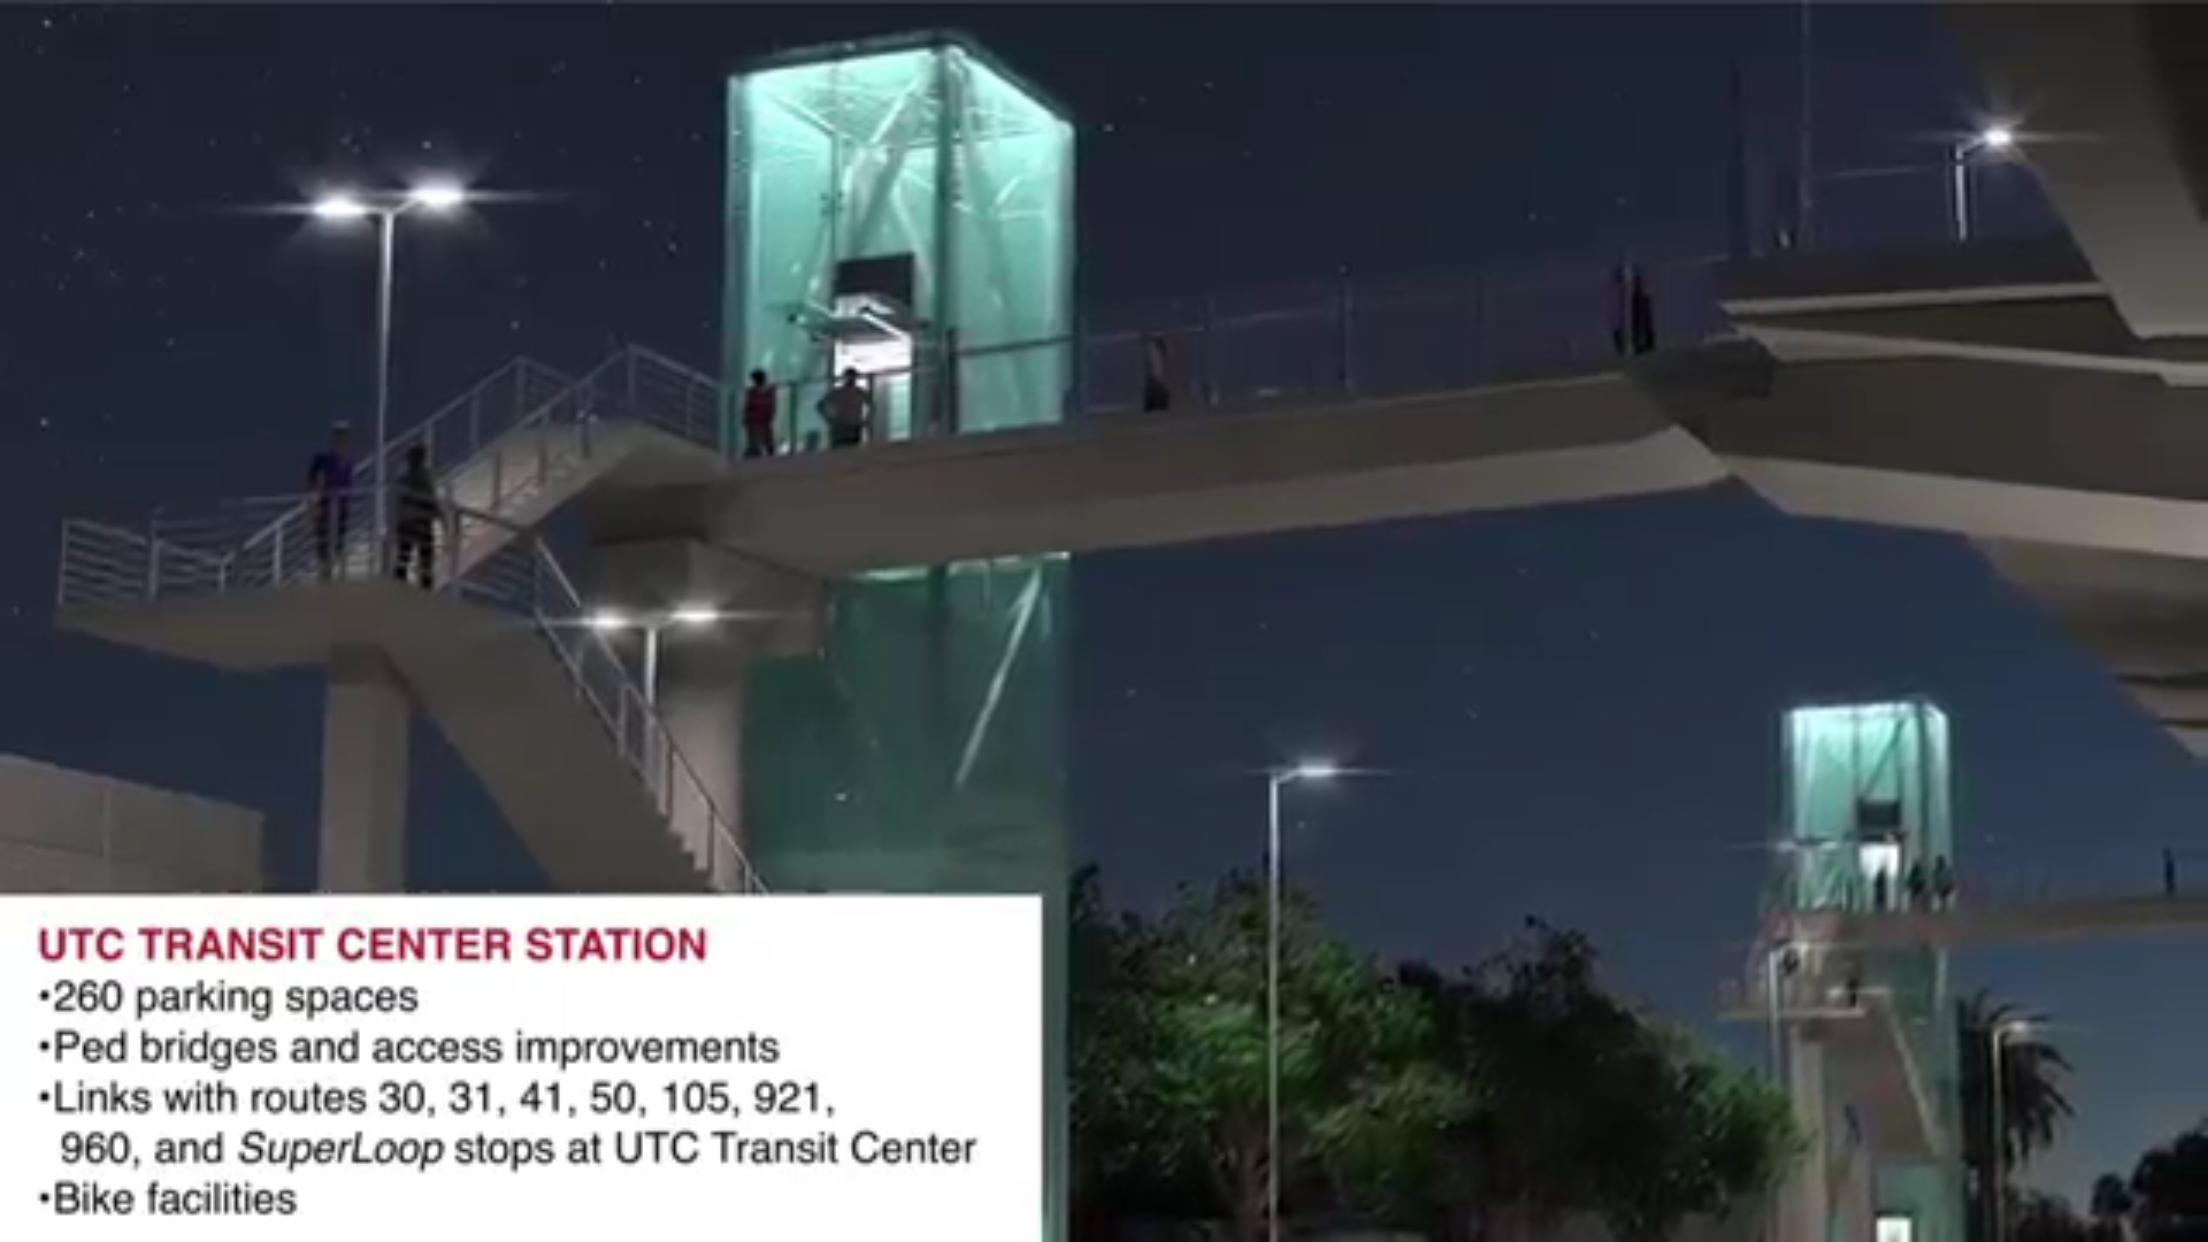 Trolley UTC Transit